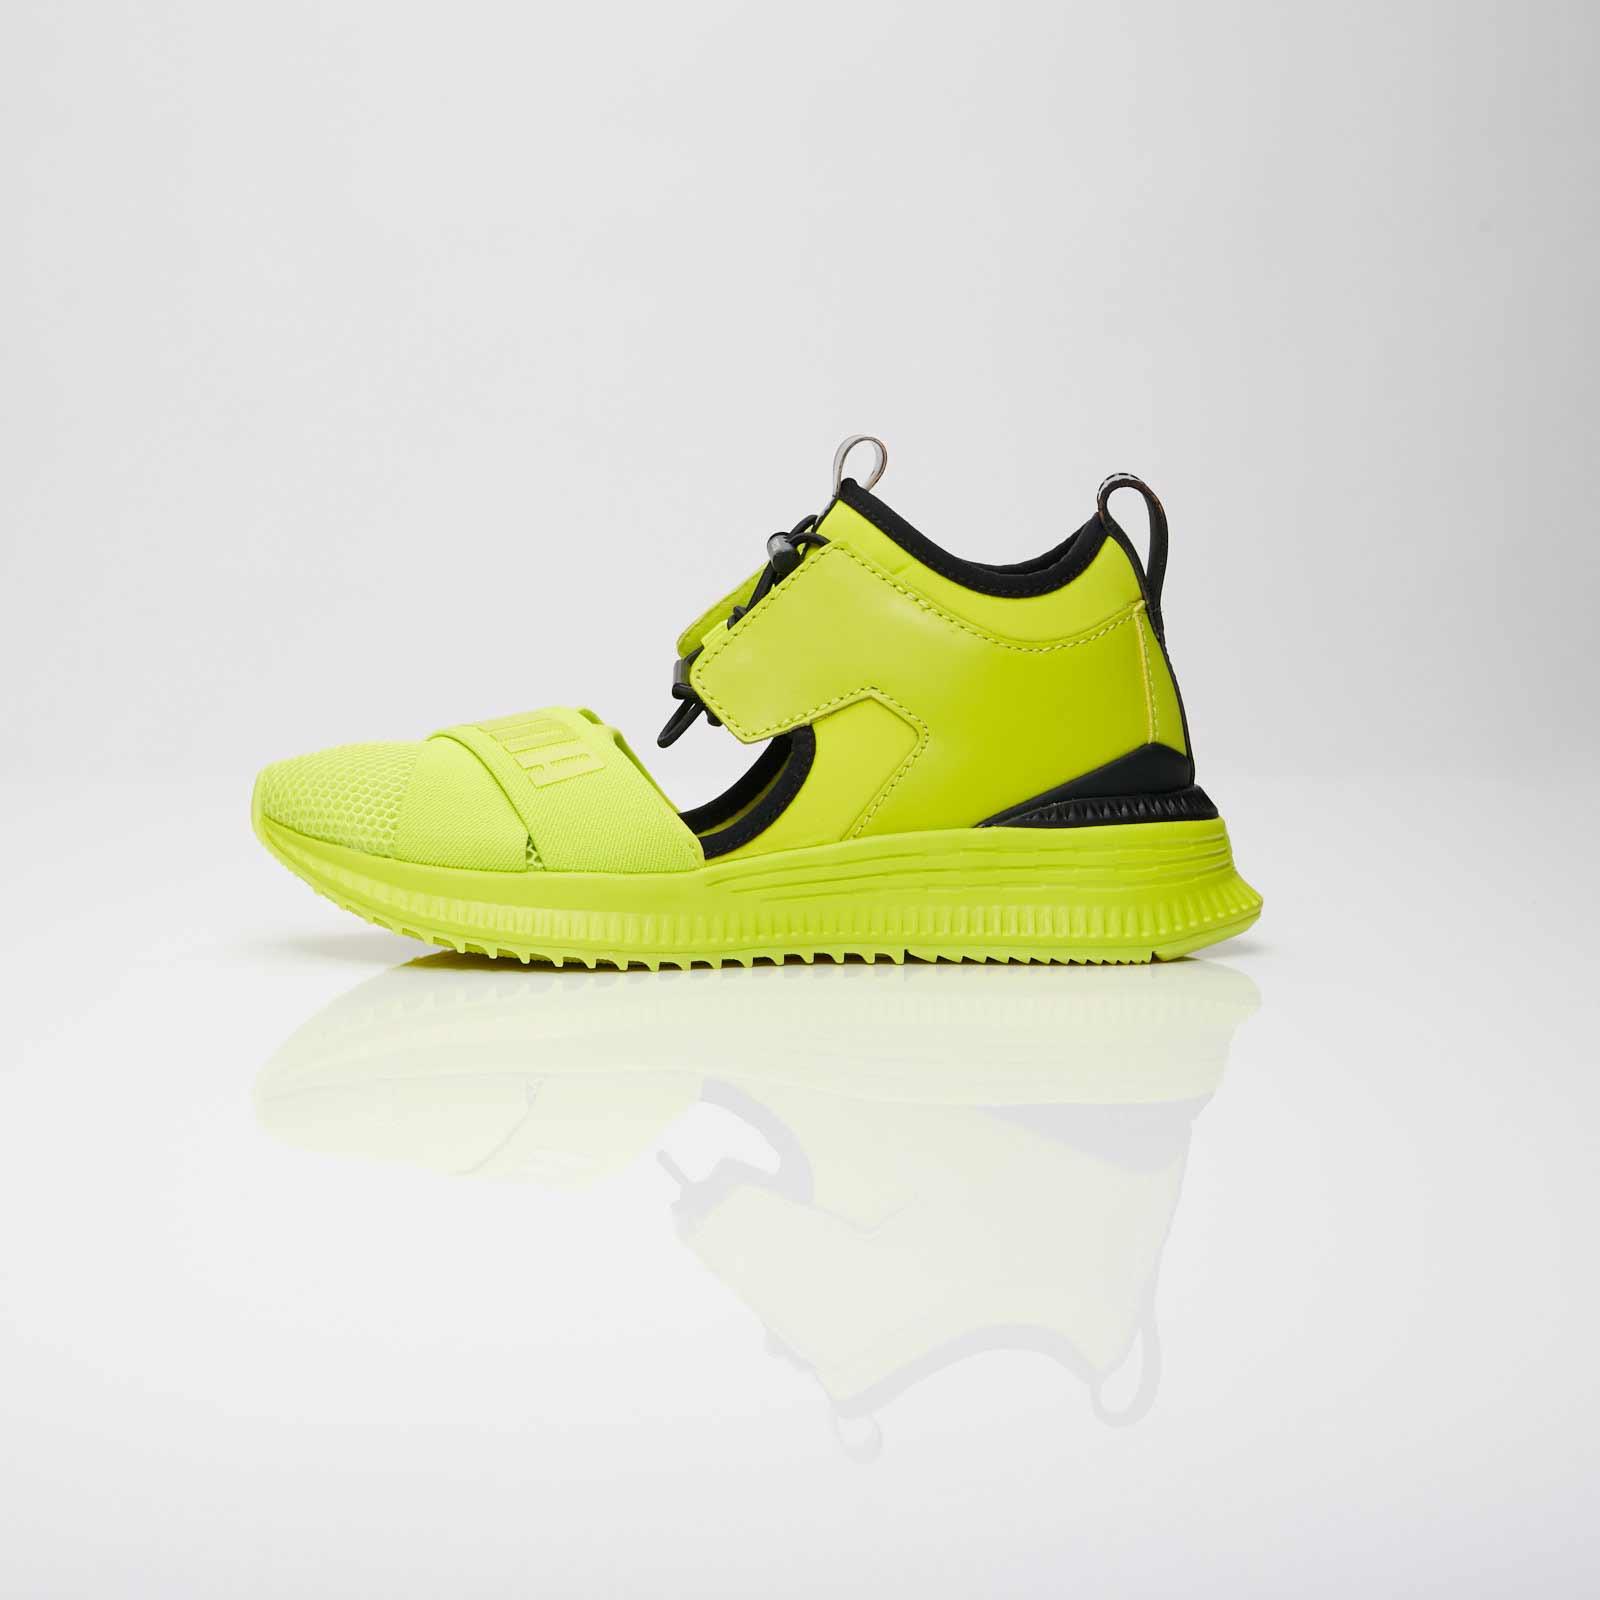 more photos b8fb5 3e260 Puma Fenty Avid Wns - 367683-03 - Sneakersnstuff | sneakers ...